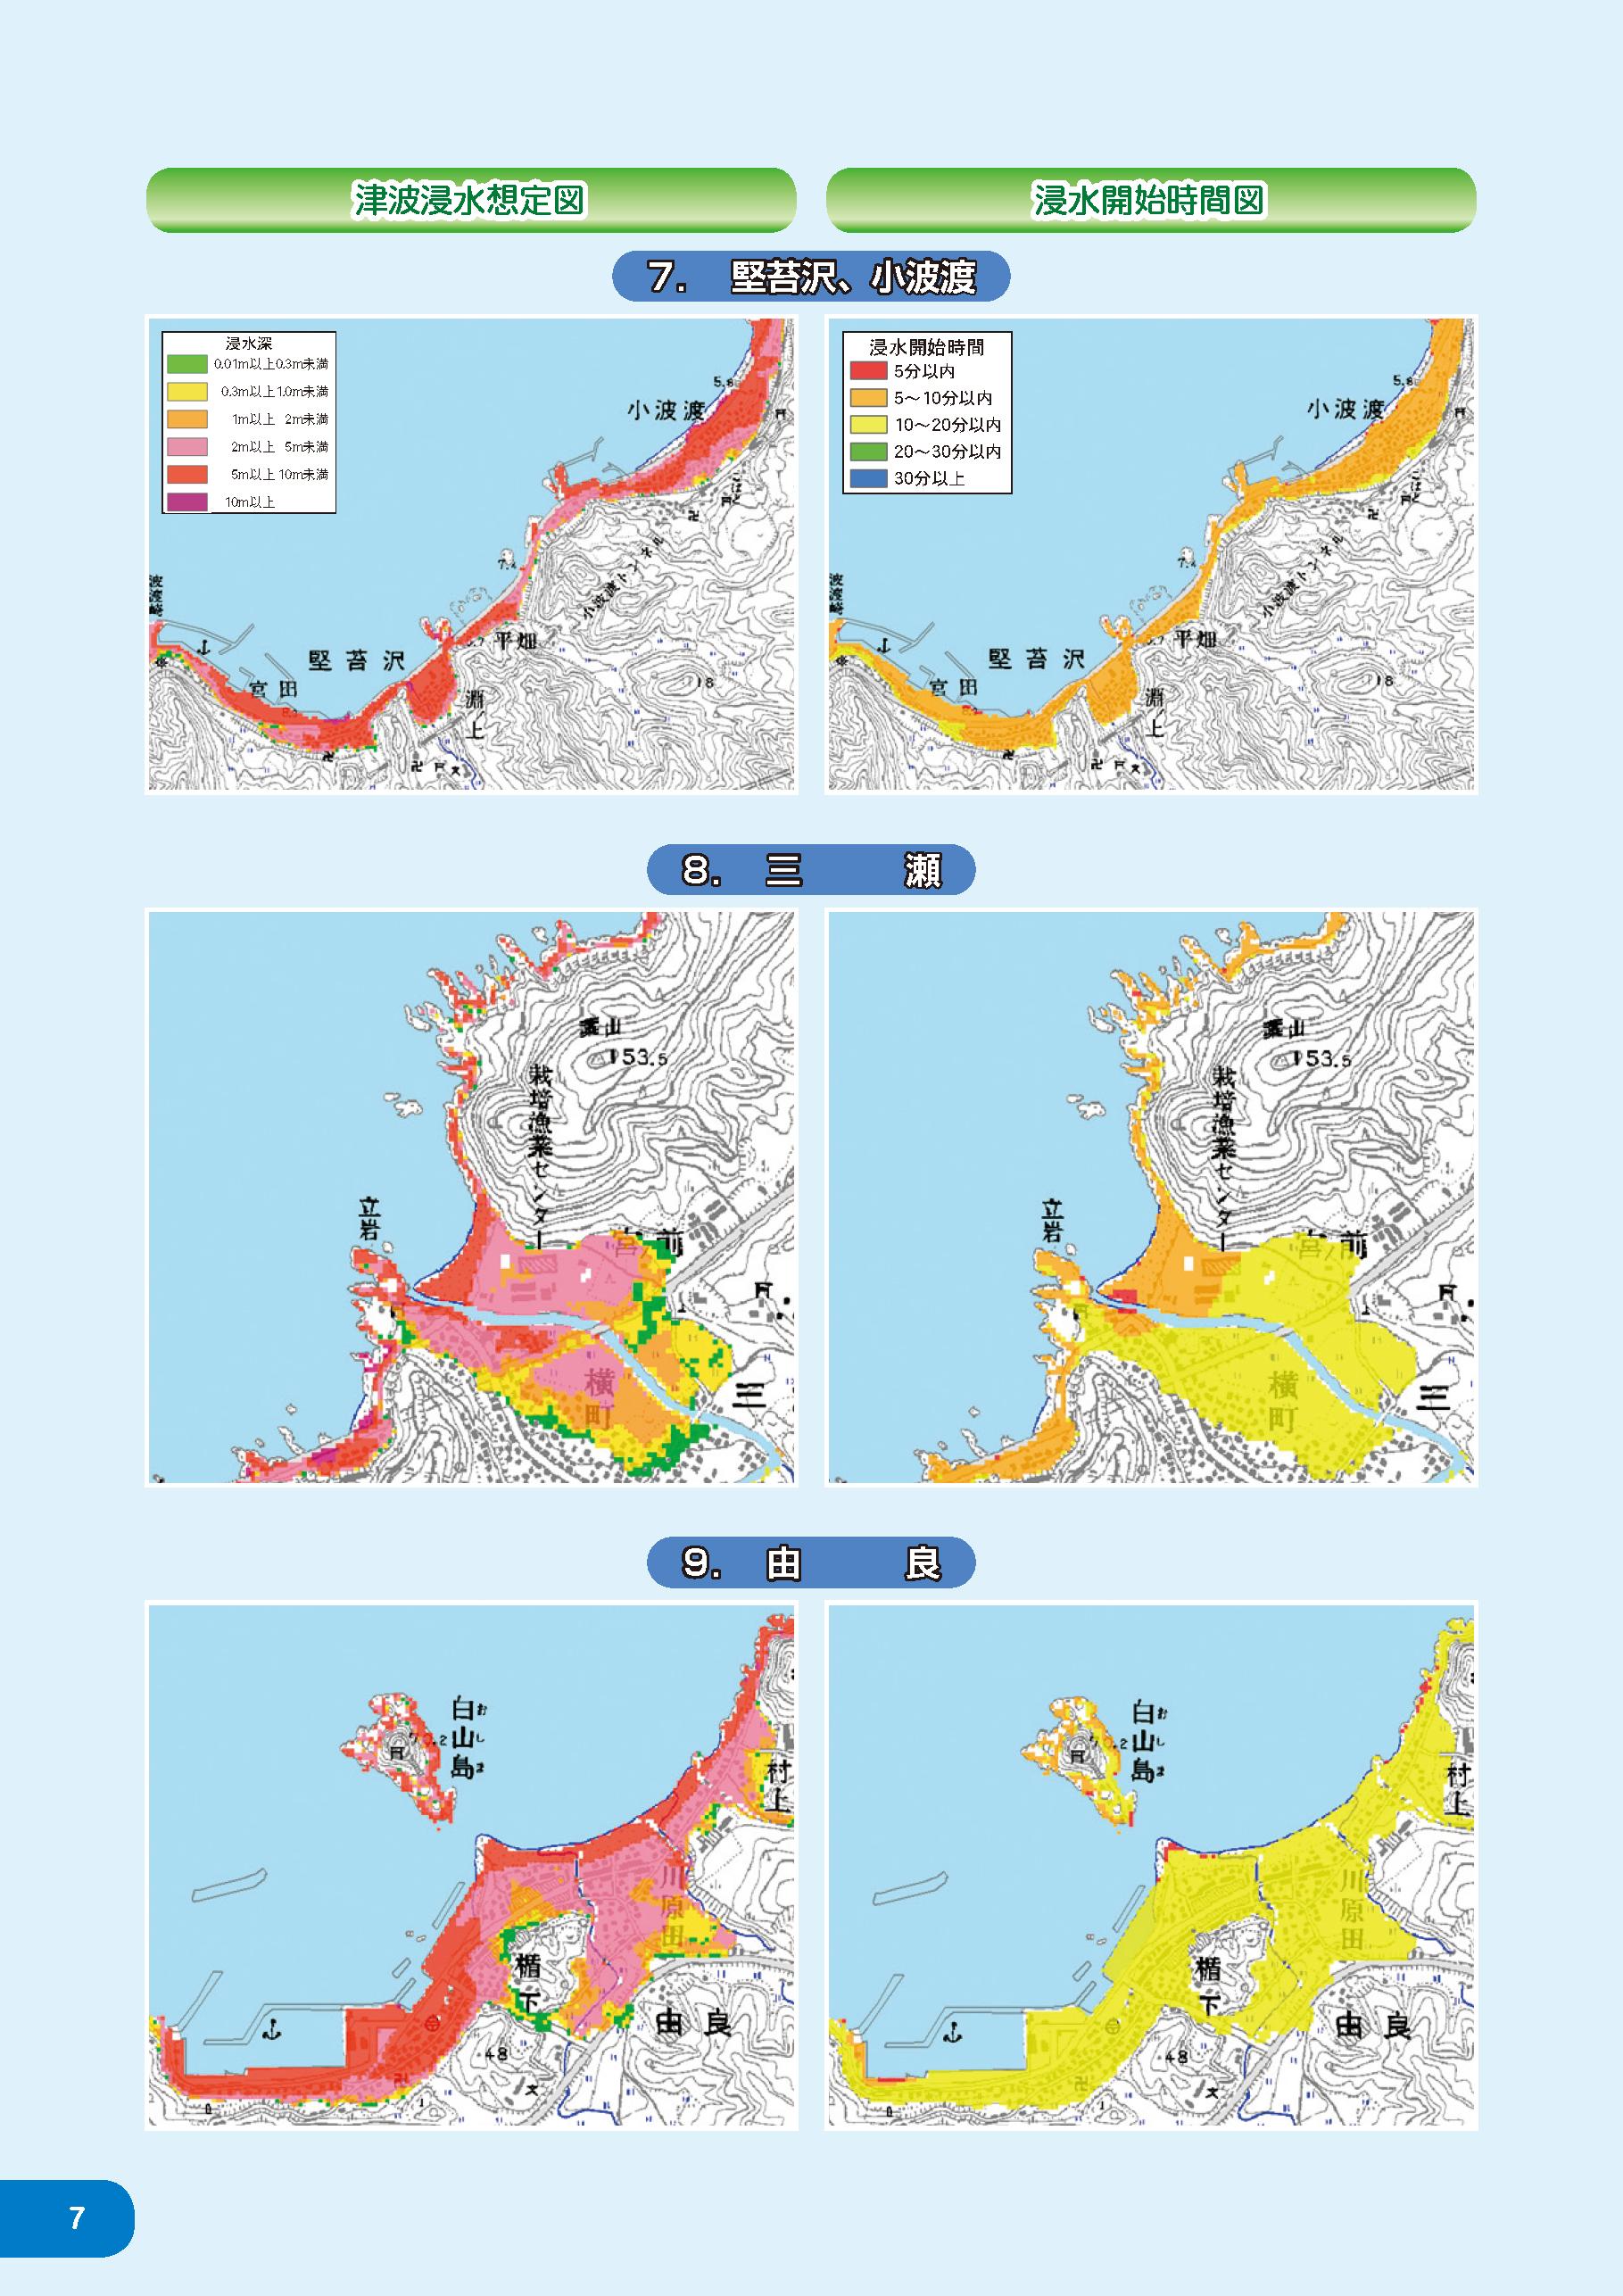 堅苔沢・小波渡・三瀬・由良の浸水想定と浸水開始時間